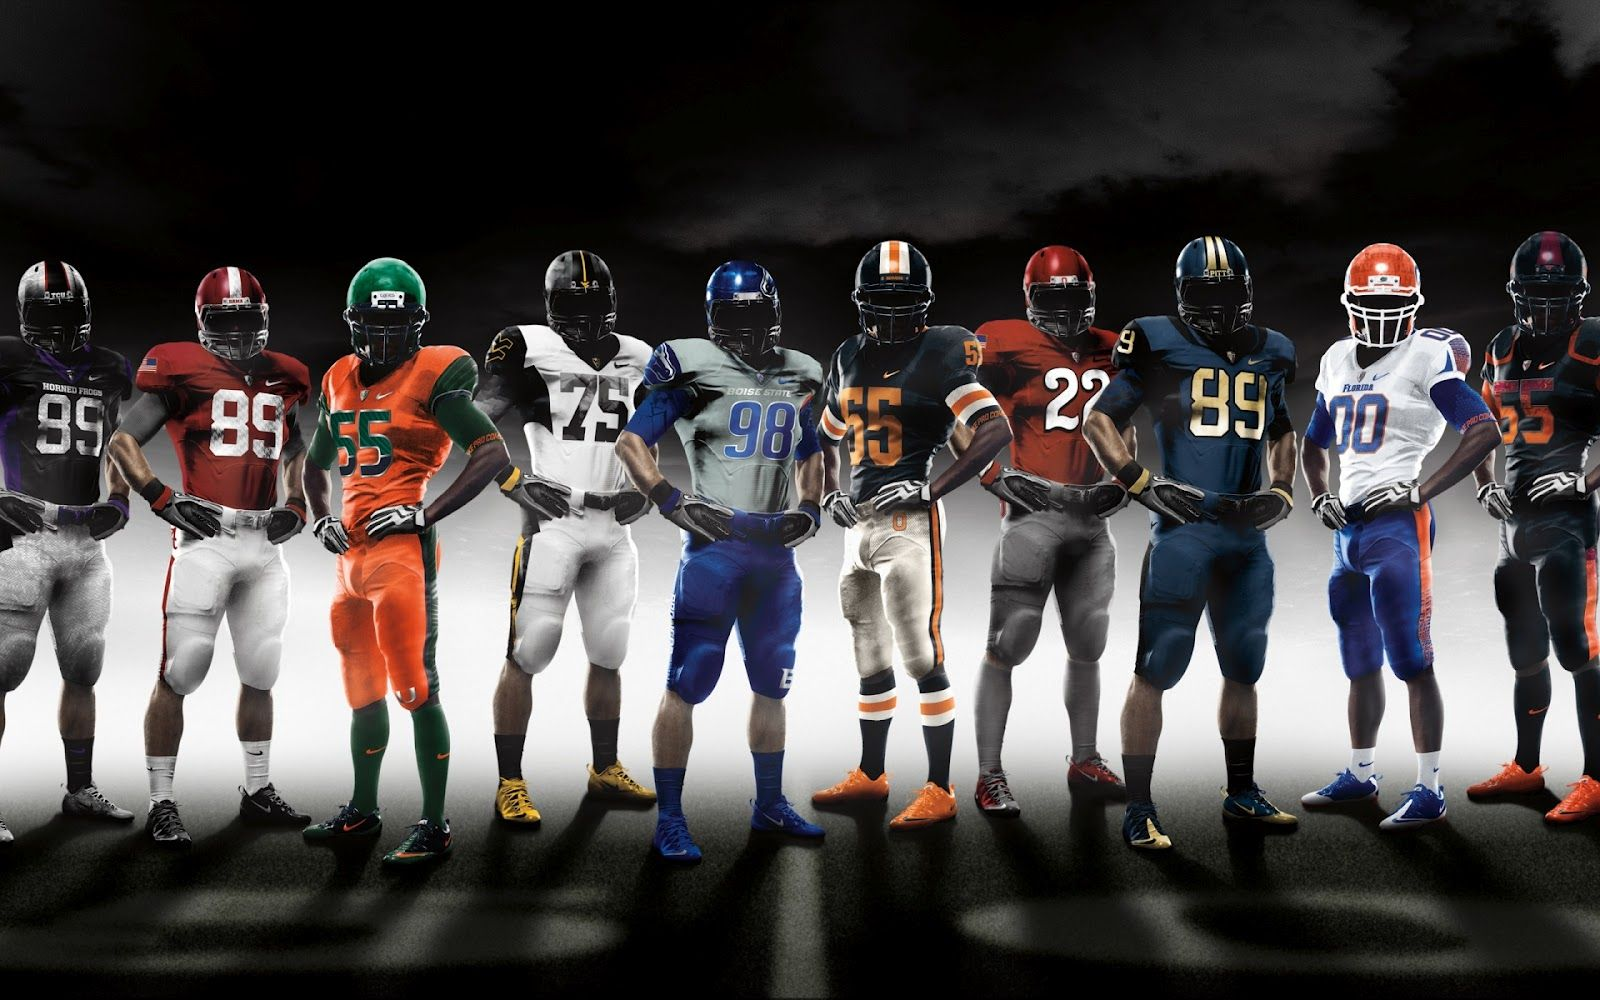 Football Teams American Football Teams Full Hd Desktop Wallpapers 1080p Football Americain Football Vs